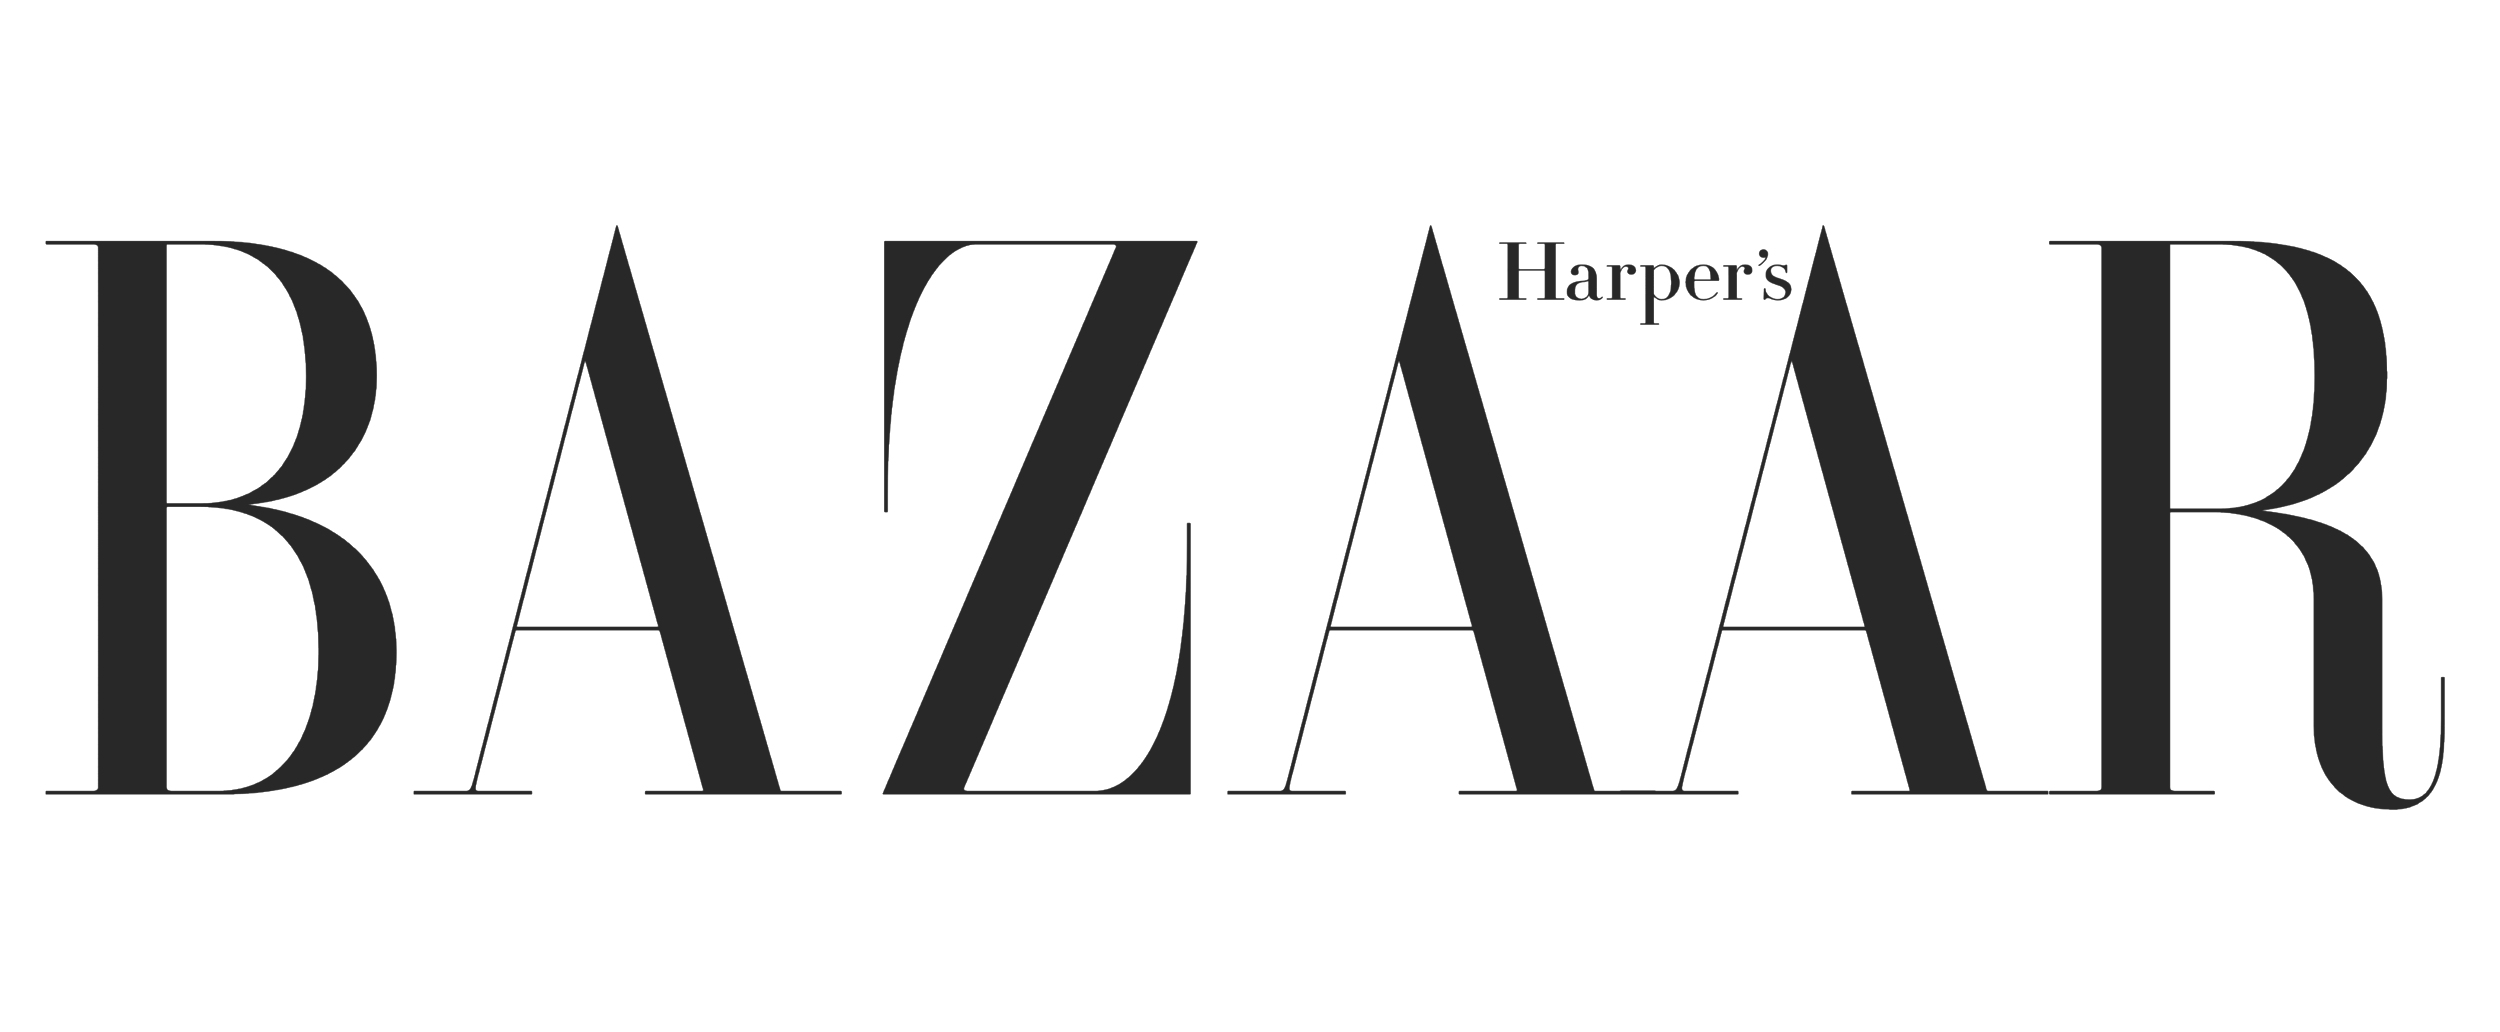 Harpers-Bazaar-lane-and-lanae.png